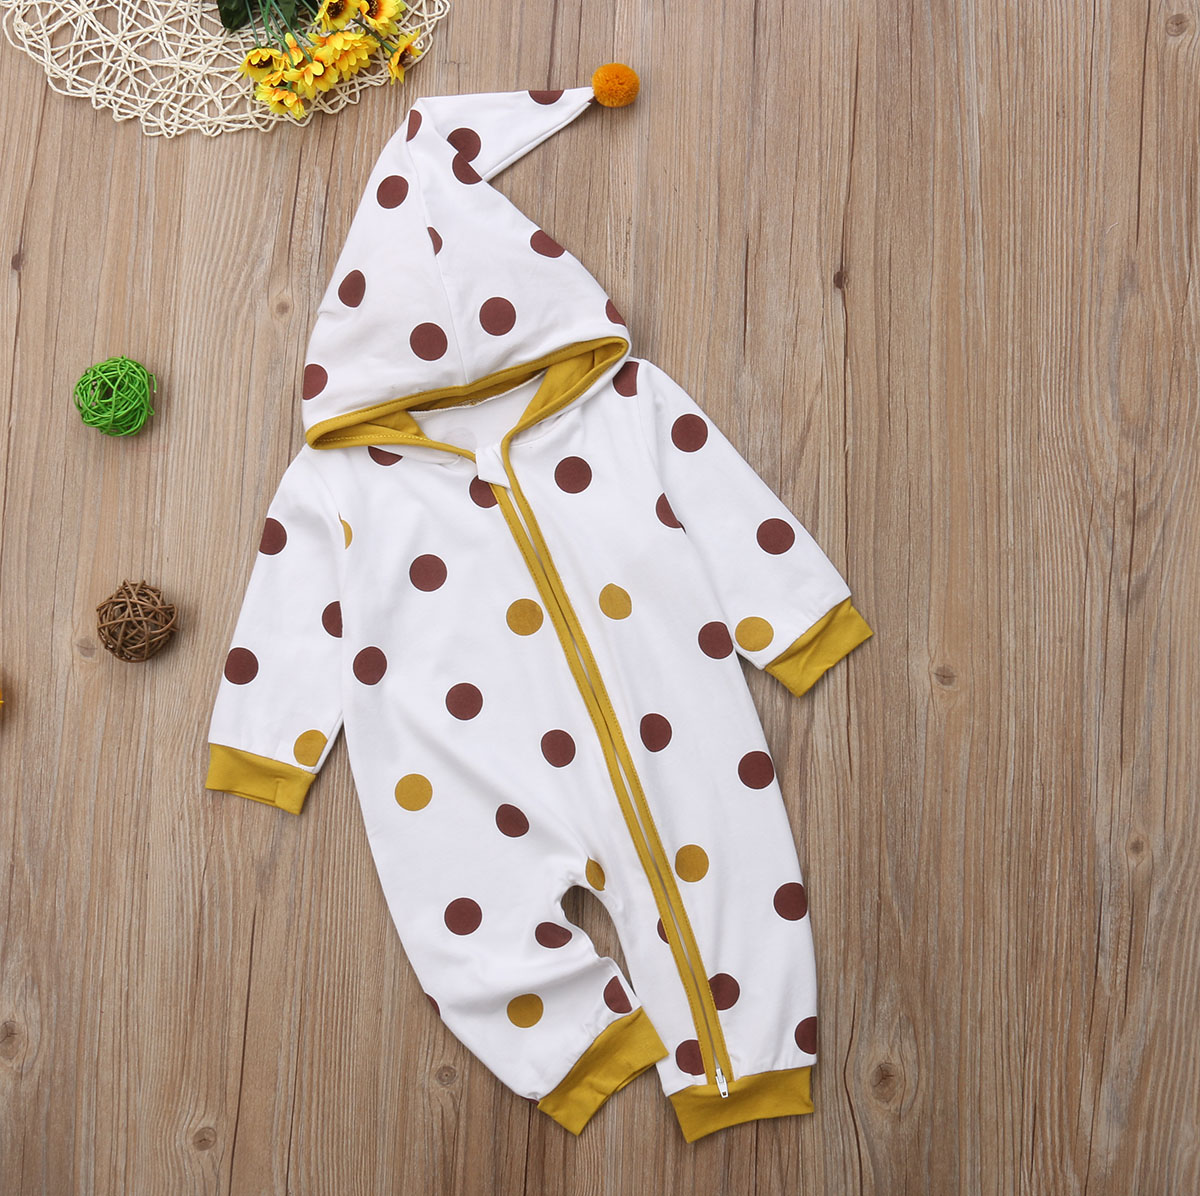 URSING Newborn Baby Boy Girl Snowsuit Fall Winter Thick Warm Jumpsuit Onesies Romper Soft Sleepsuit Cartoon Outfits 0-18 Months